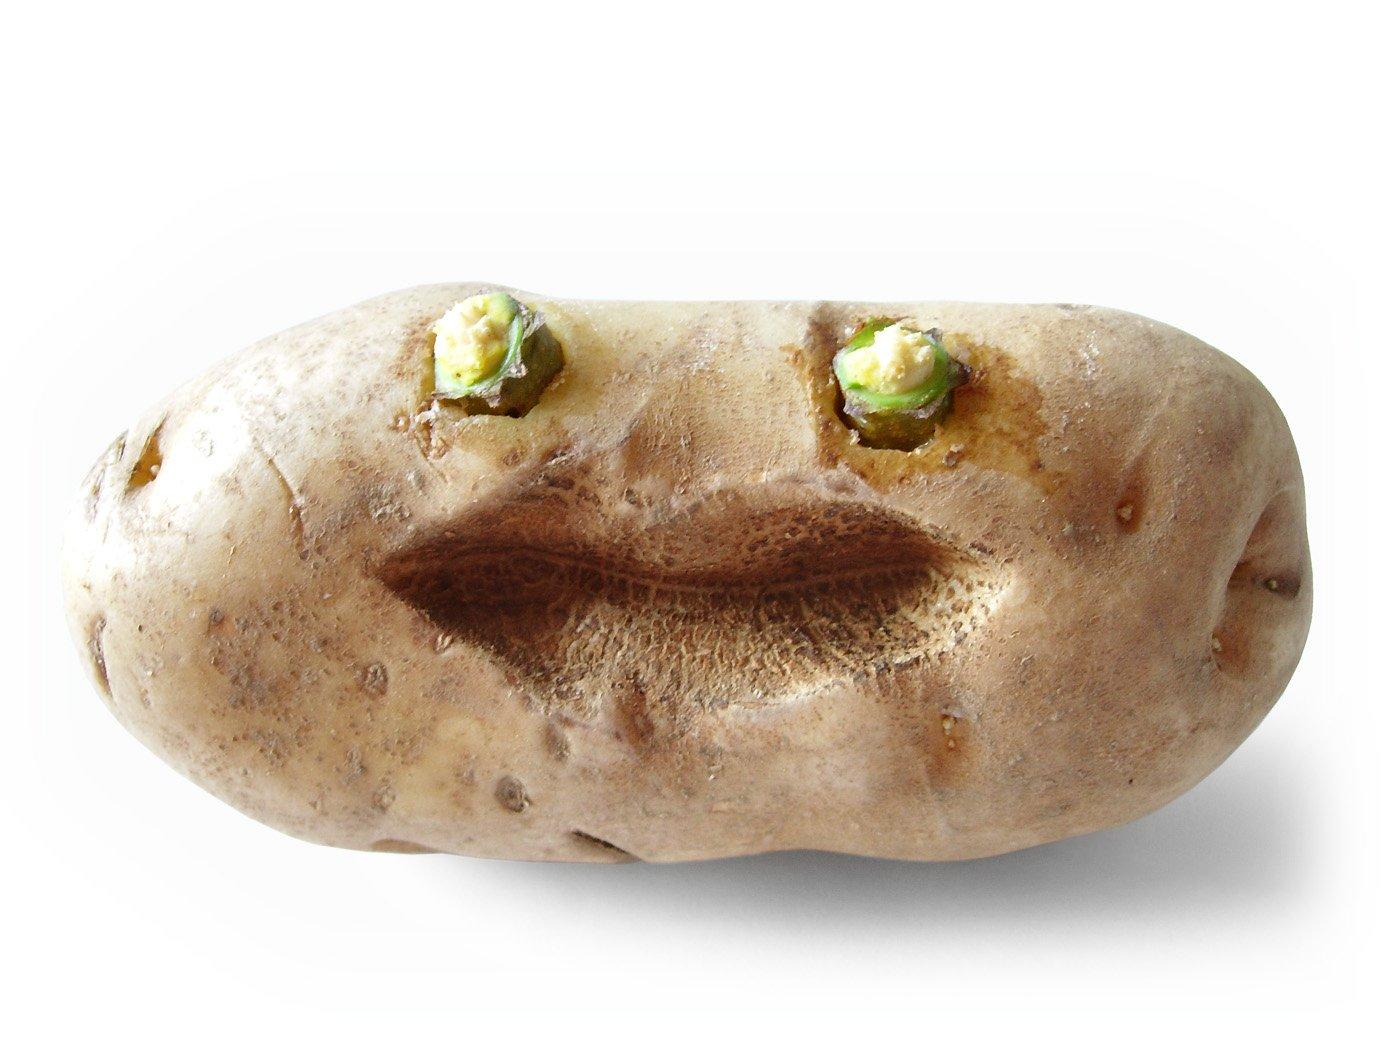 Kostenlose funny potatoBilder und Stockfotografien  FreeImagescom